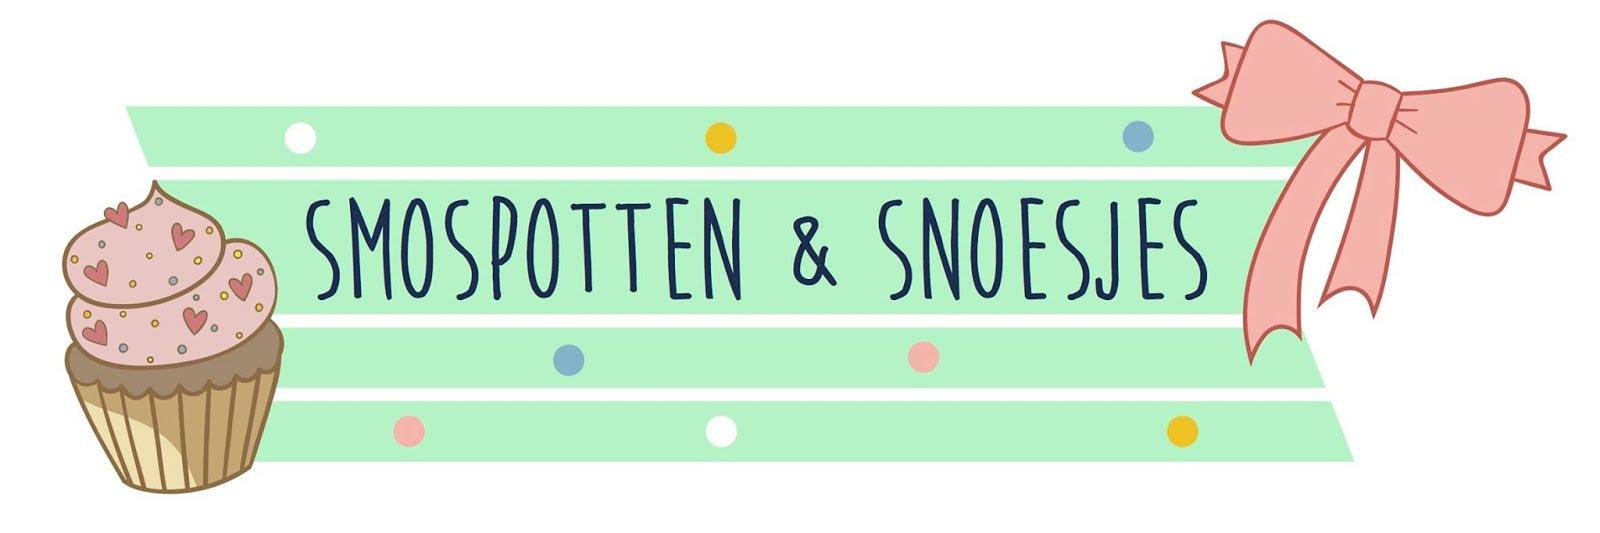 Smopotten & Snoesjes